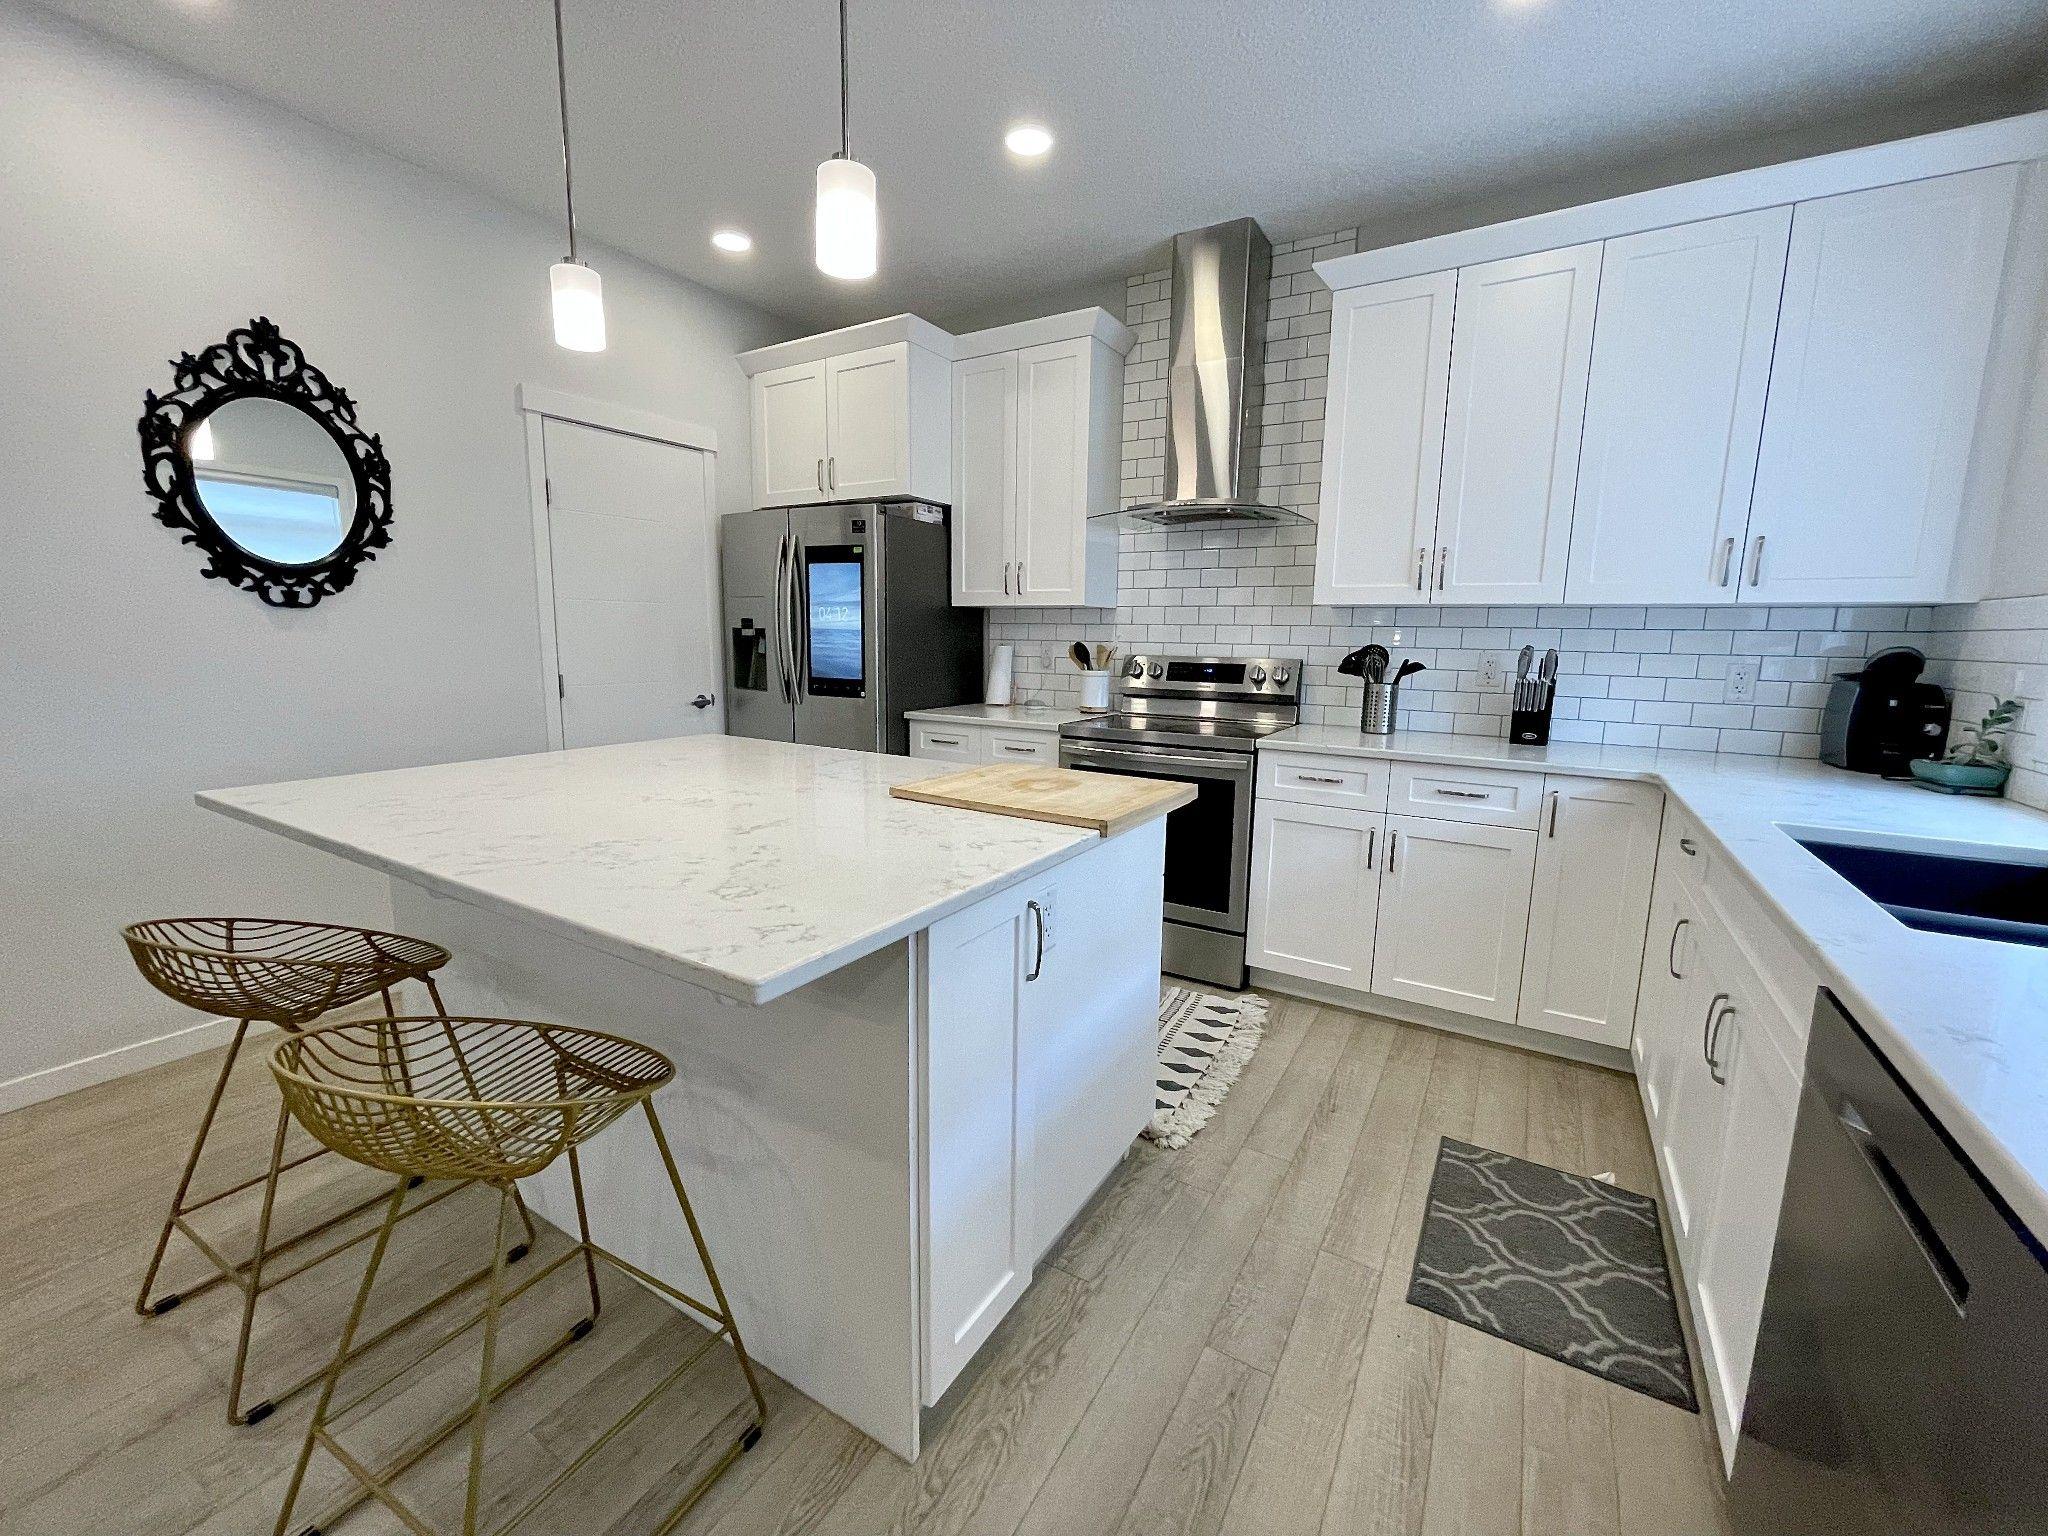 Main Photo: McConachie in Edmonton: House for rent